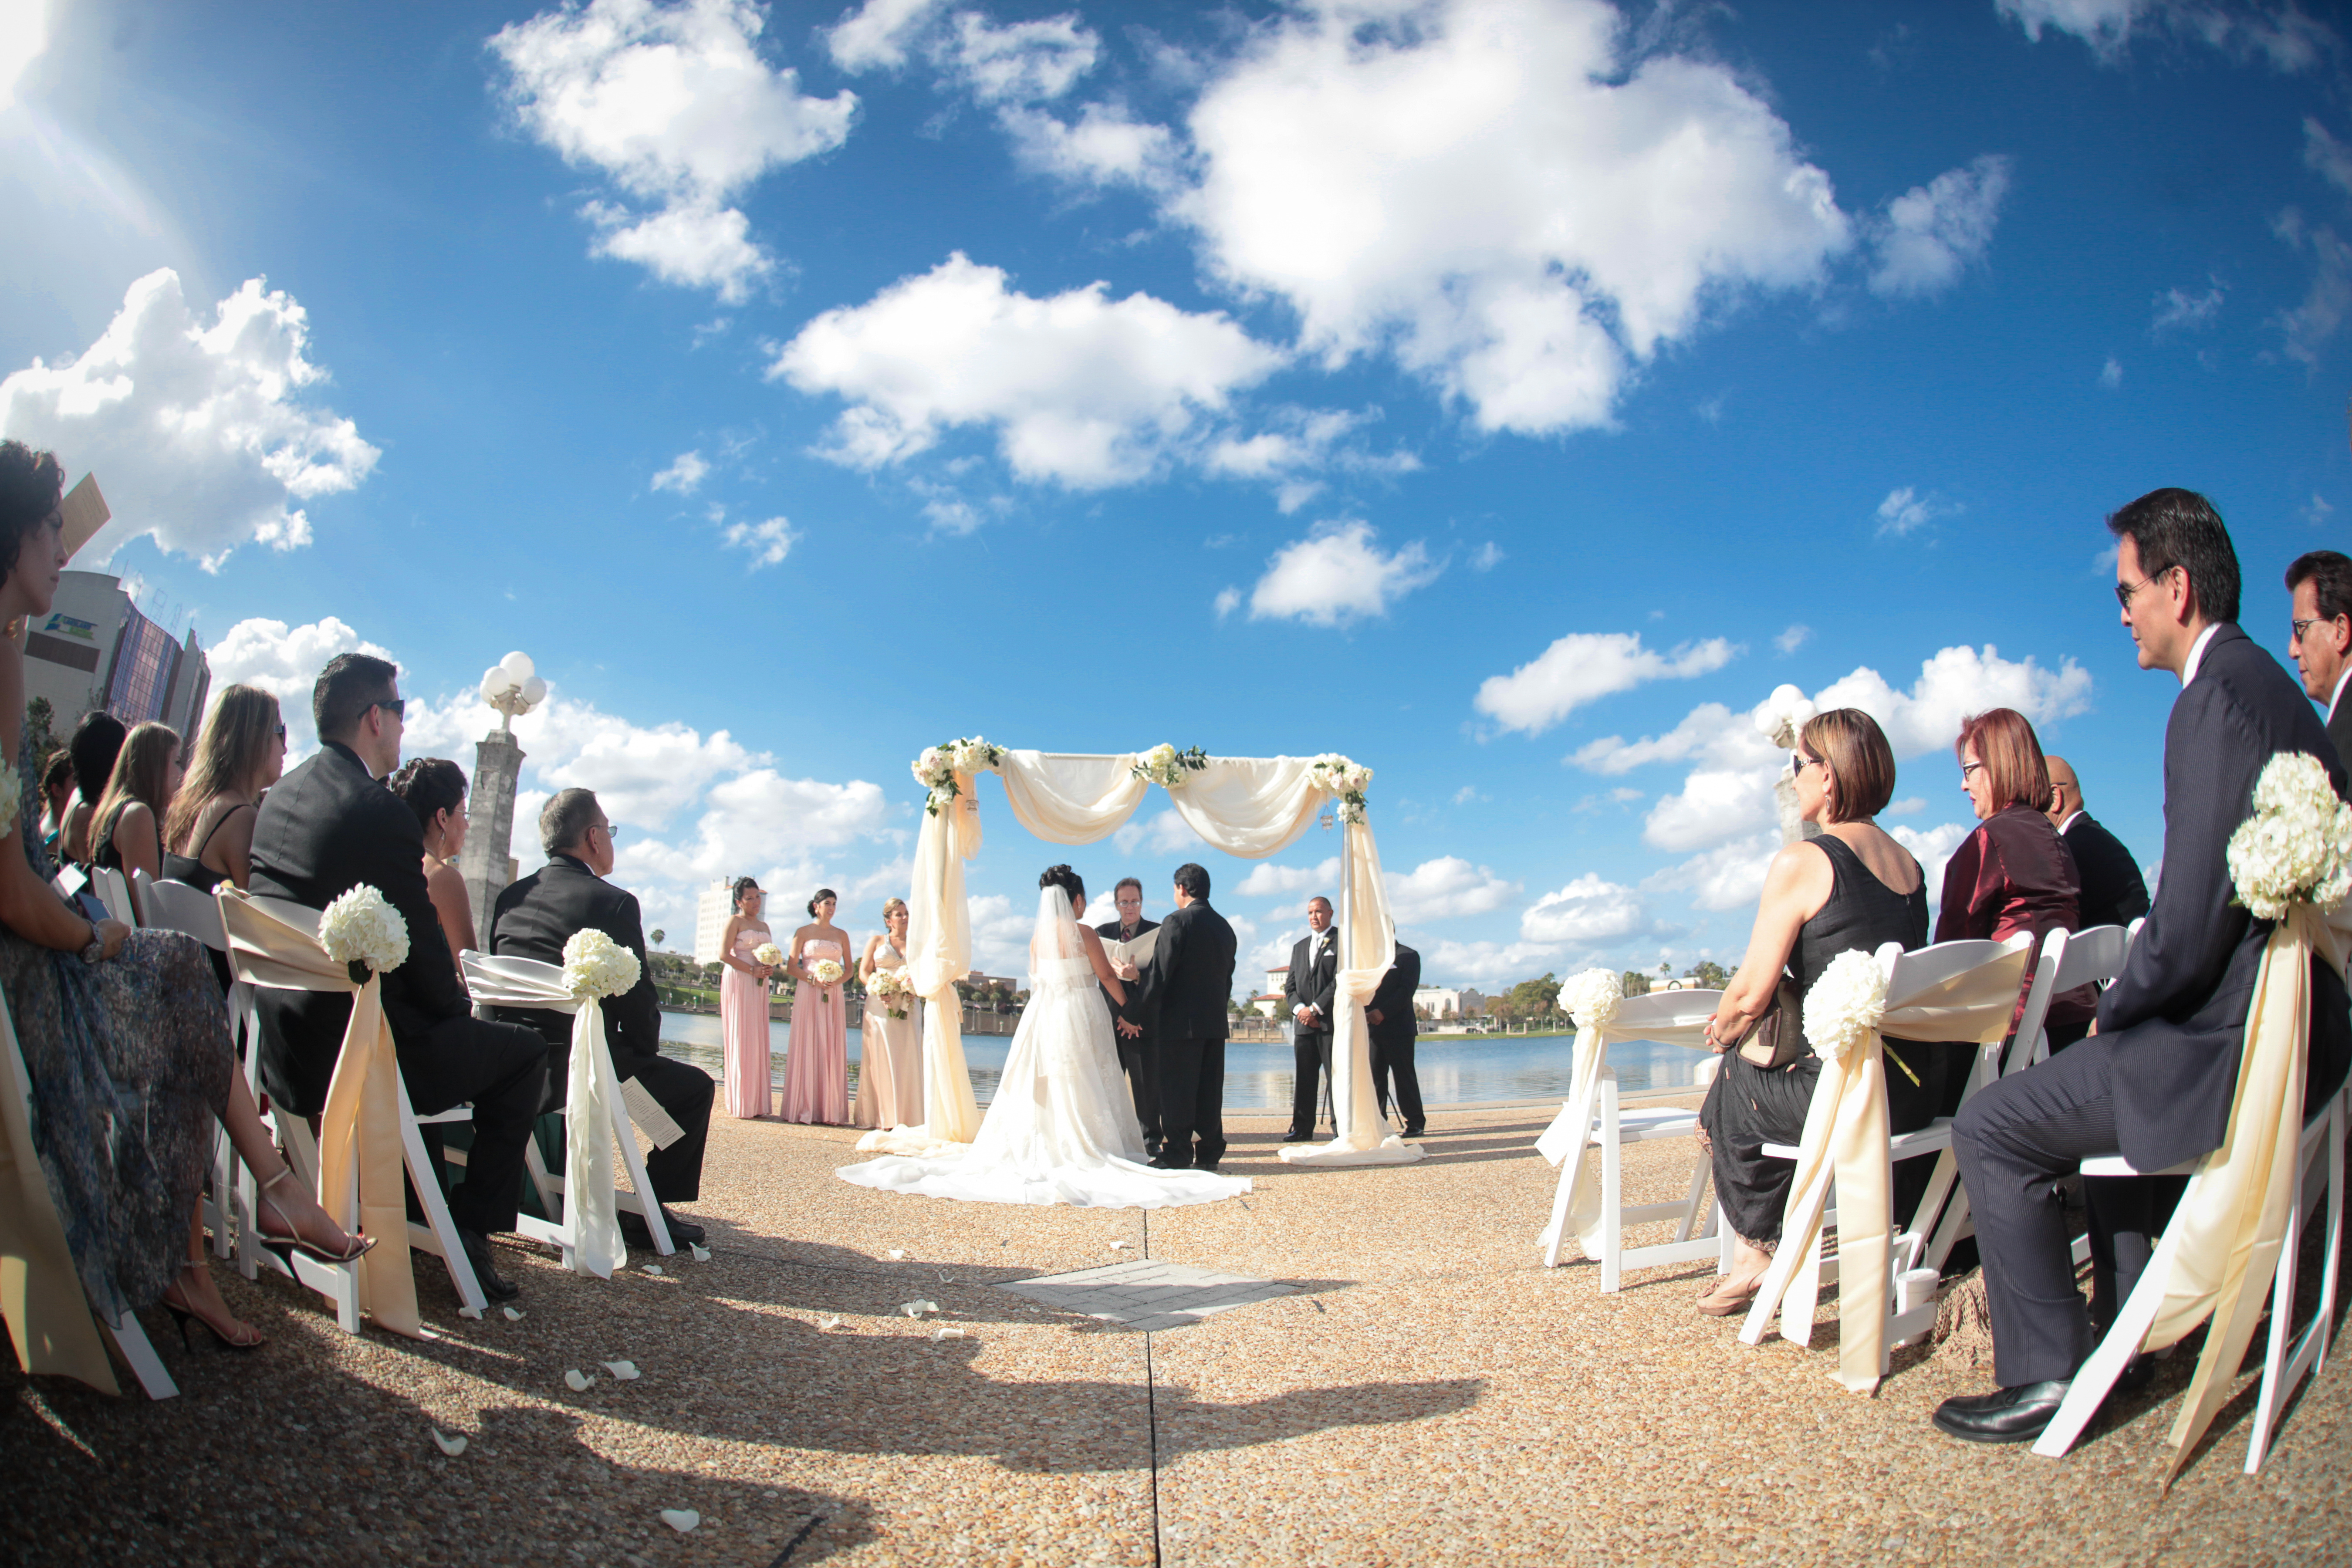 Unique wedding giuliana and jesus at the lake mirror amphitheater 7 lake mirror ampitheater magnolia building wedding unique weddings junglespirit Choice Image